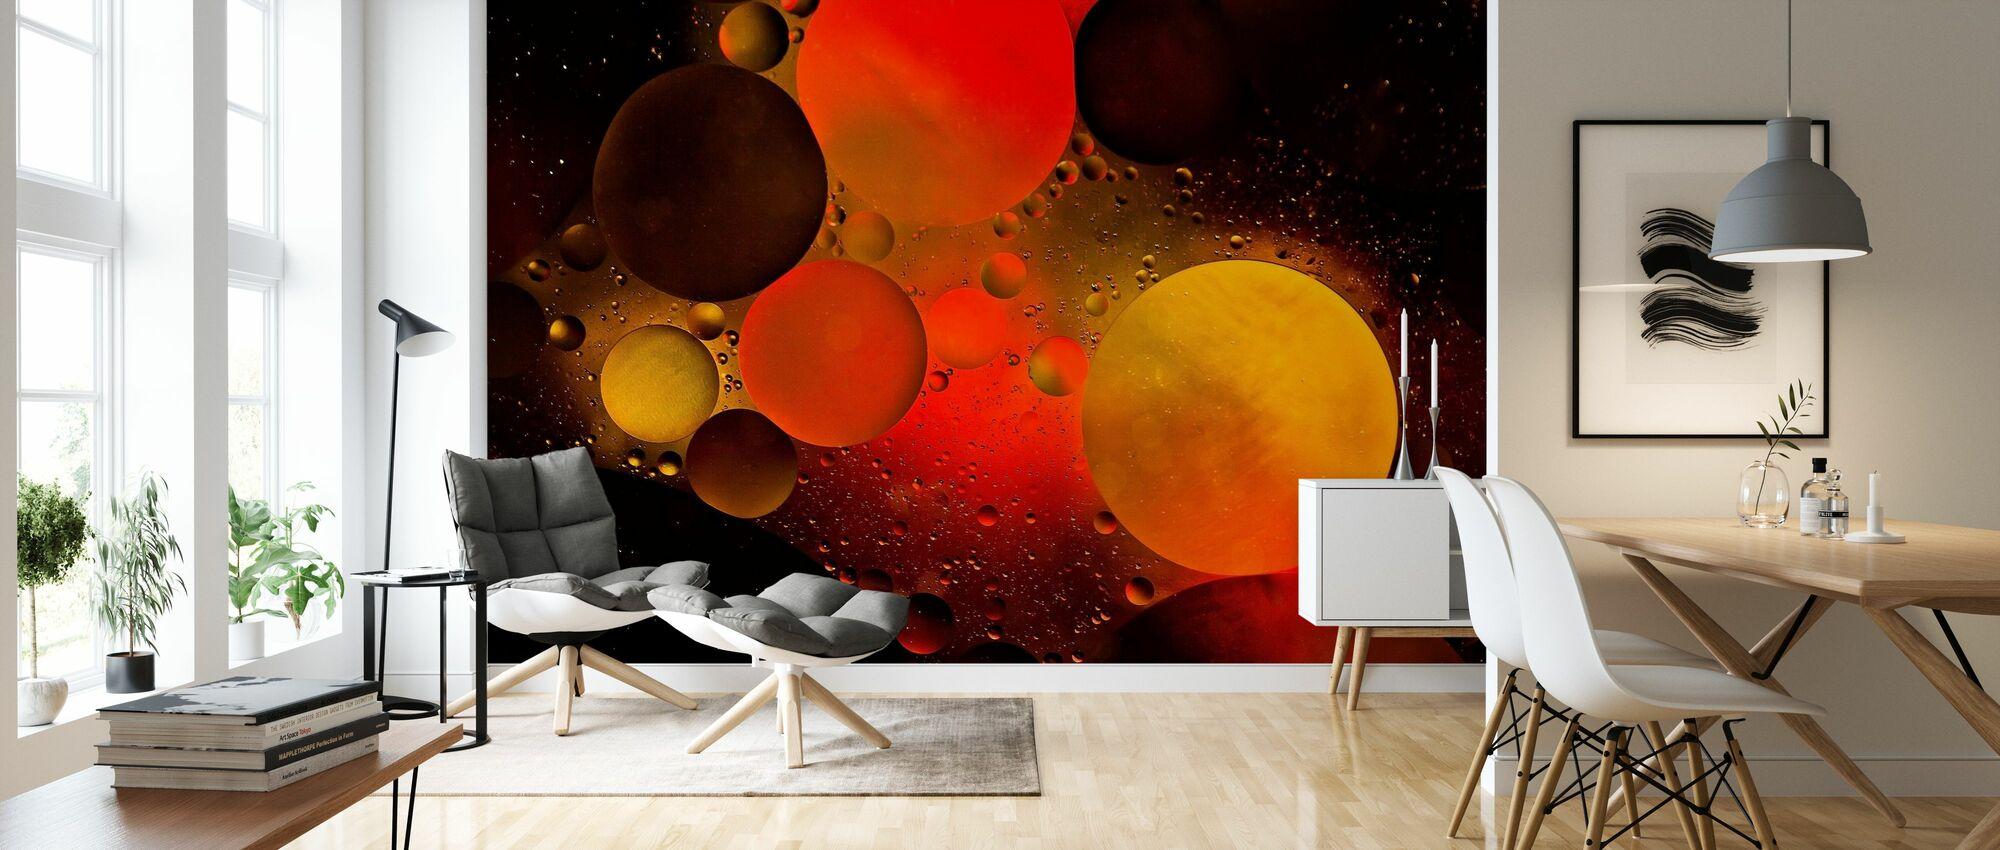 Astronomical - Wallpaper - Living Room